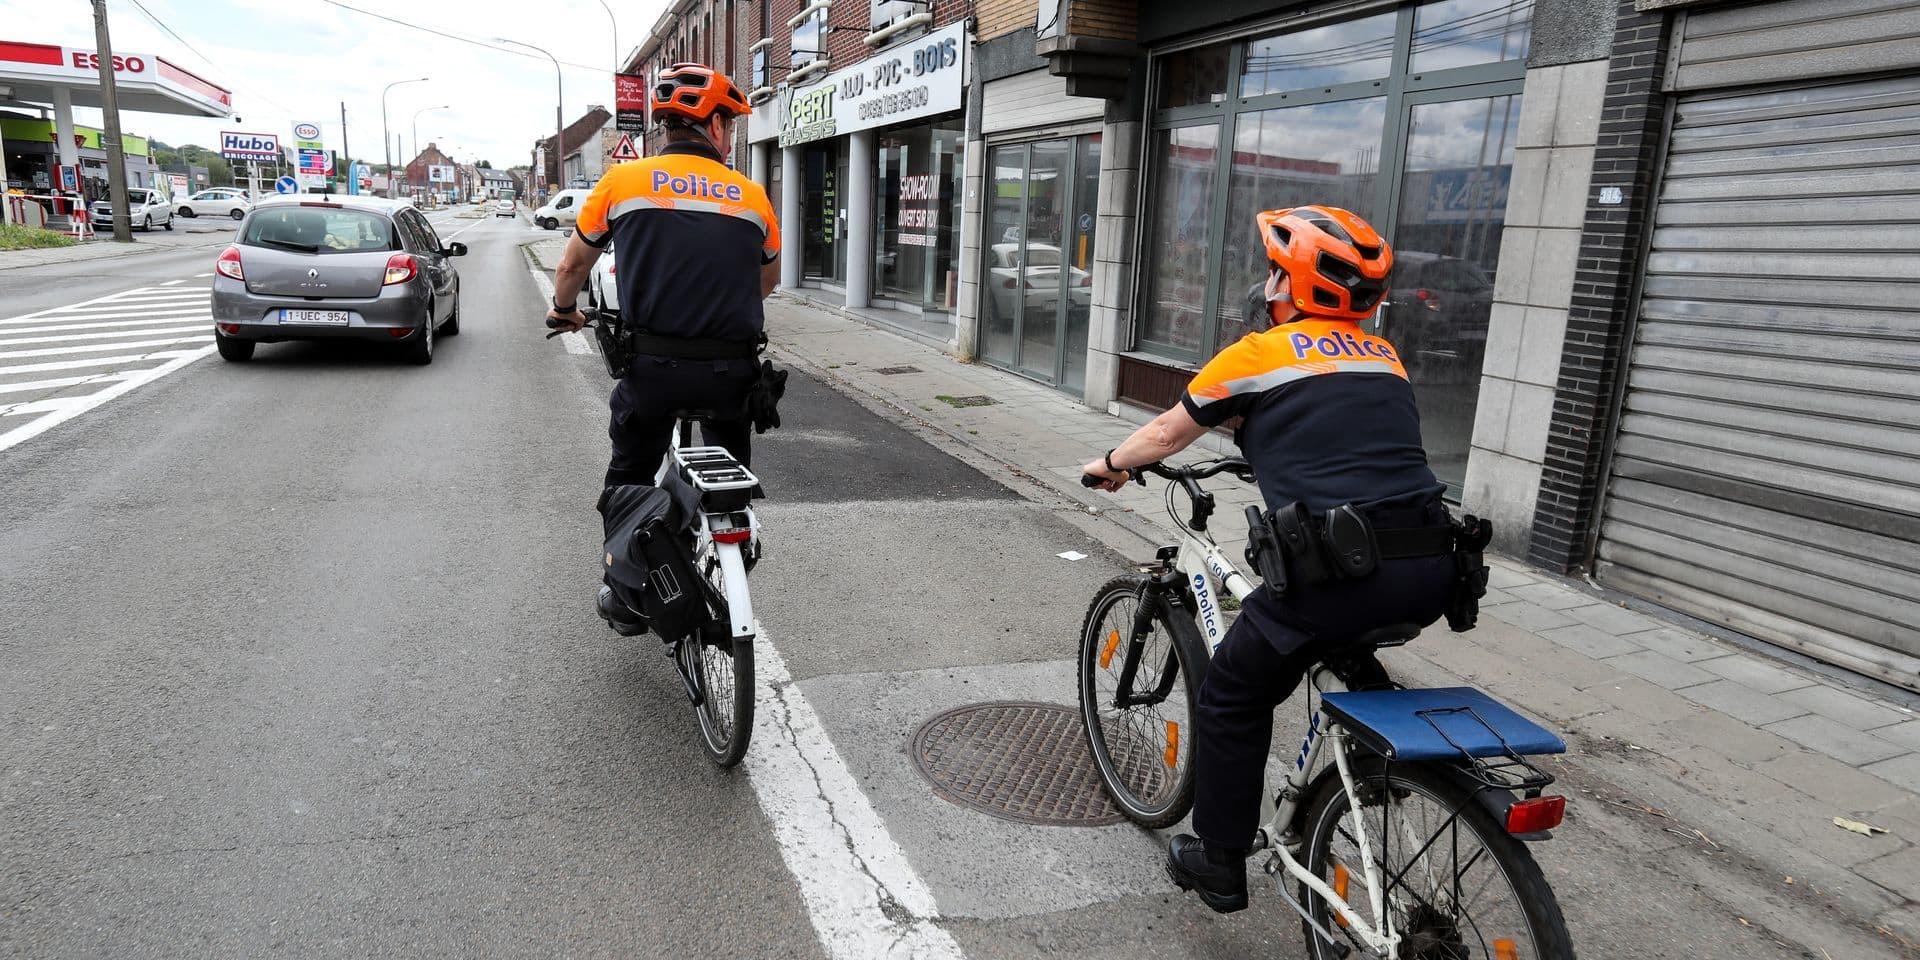 PATROUILLE POLICE VELO